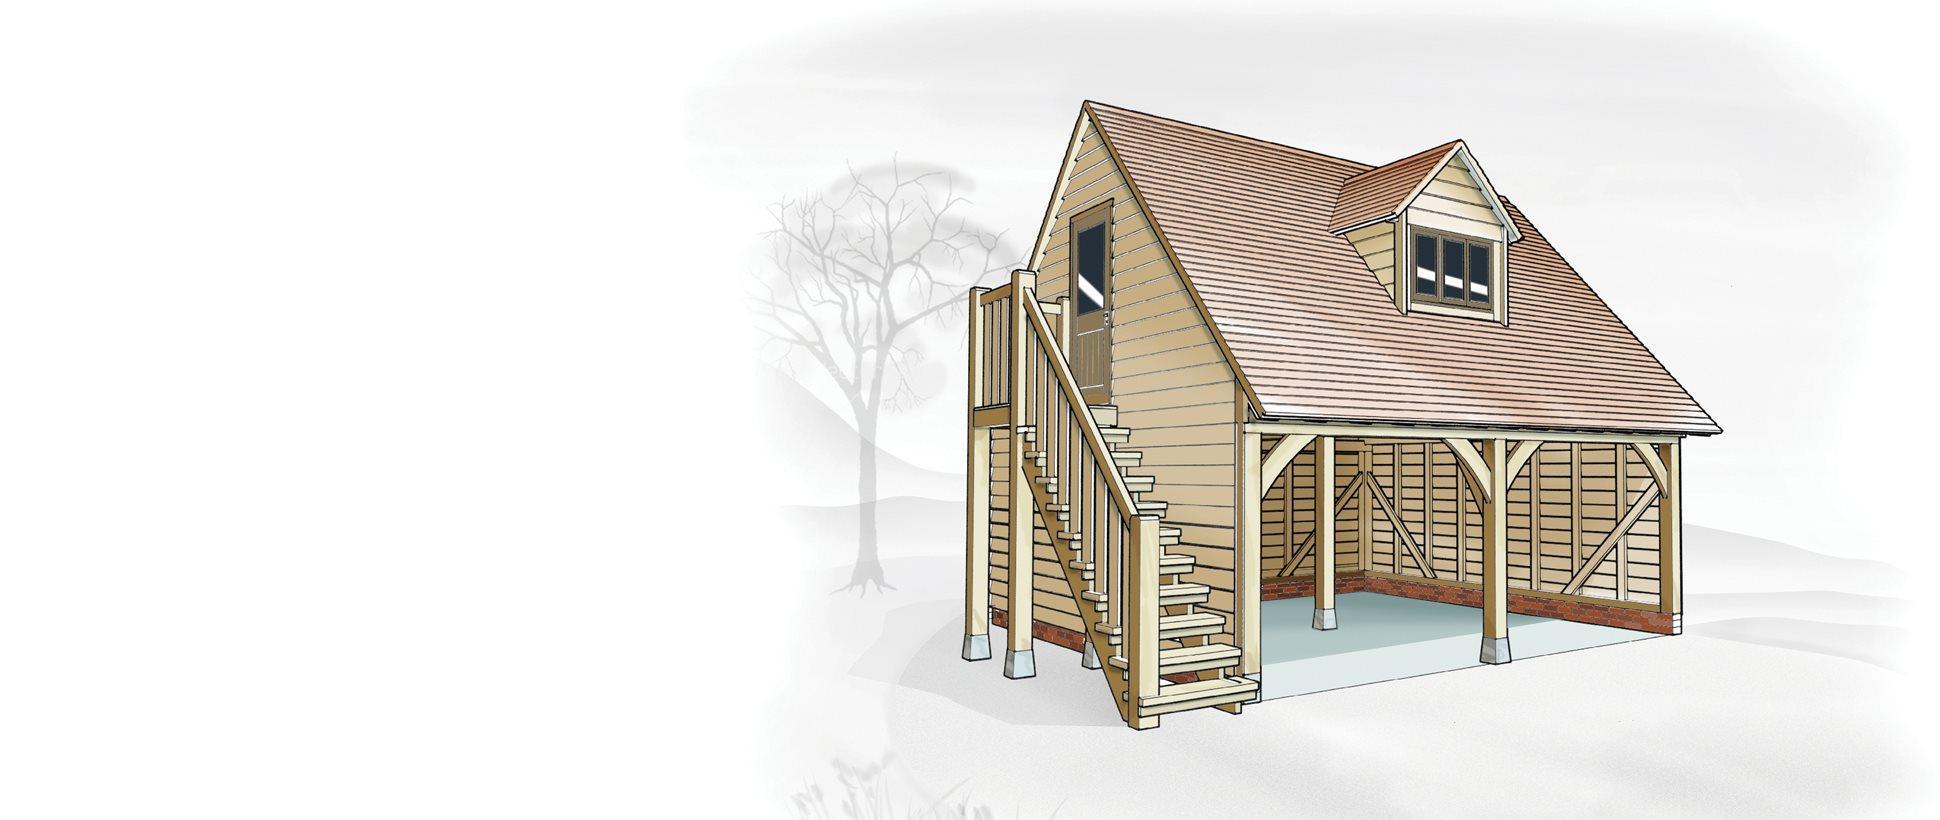 The cheltenham garage home office oak designs co - Office supplies cheltenham ...